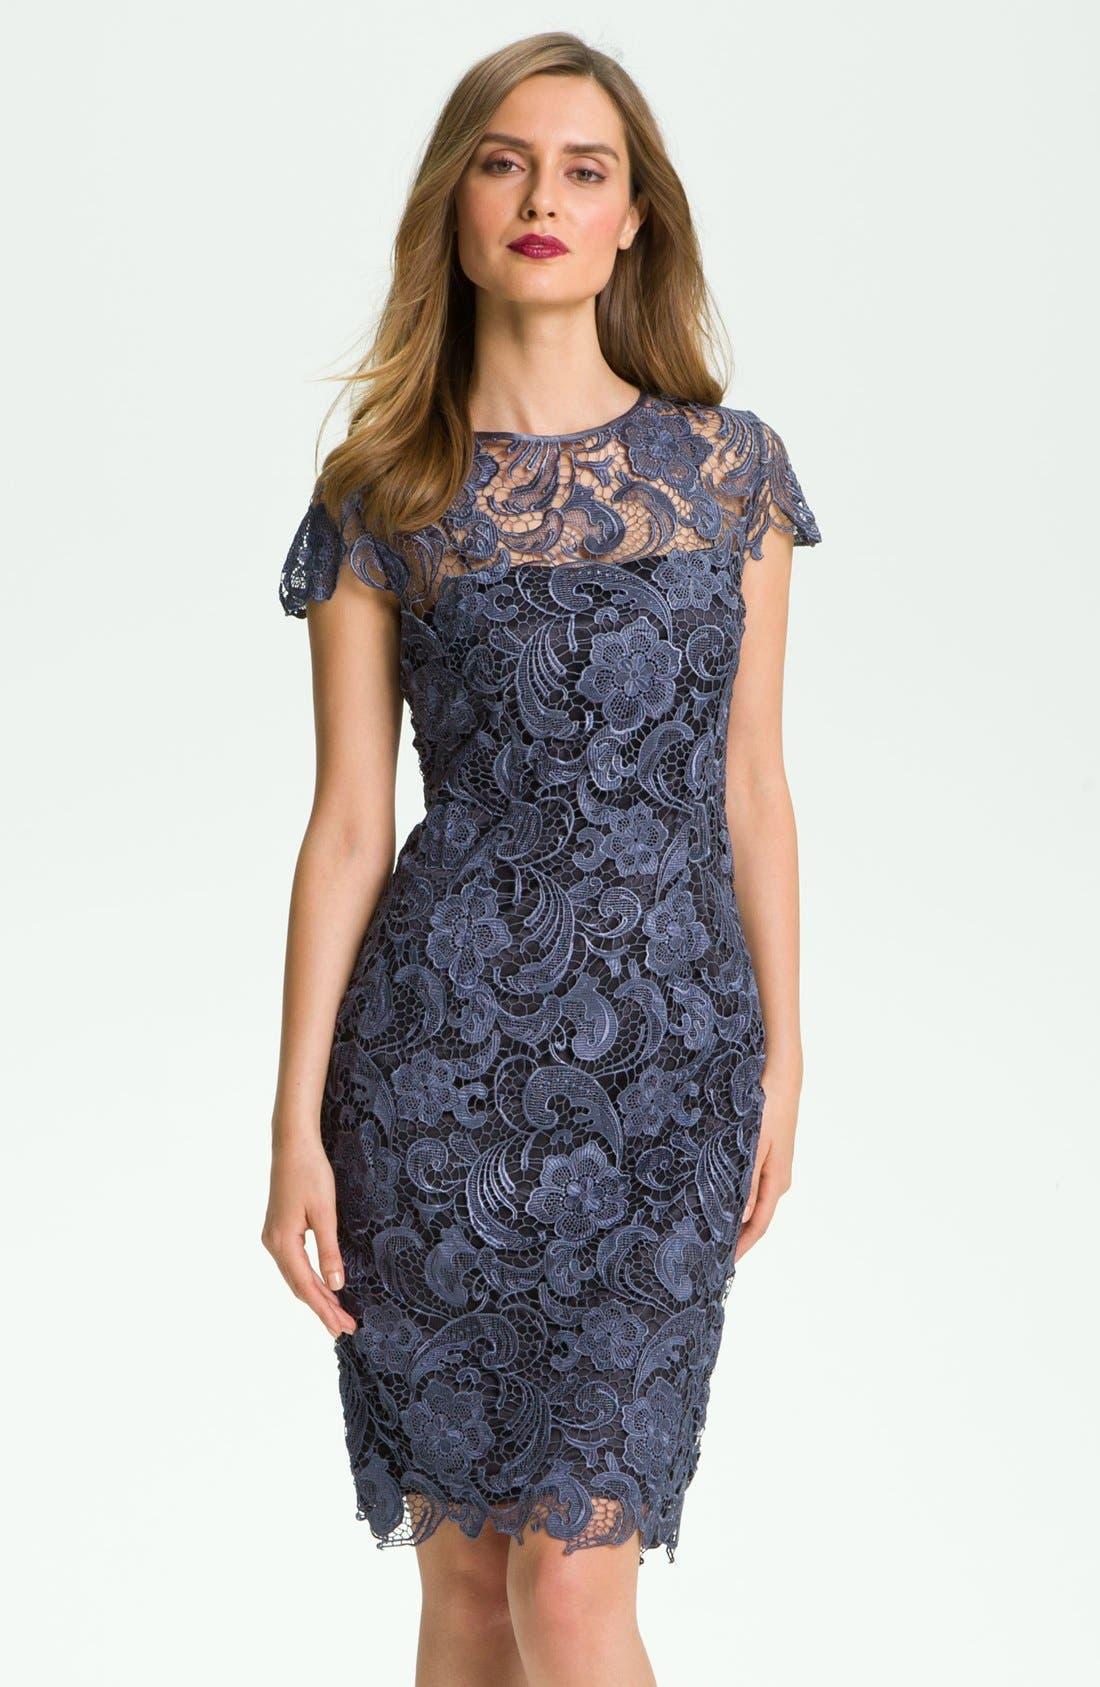 Alternate Image 1 Selected - Patra Crocheted Venise Lace Sheath Dress